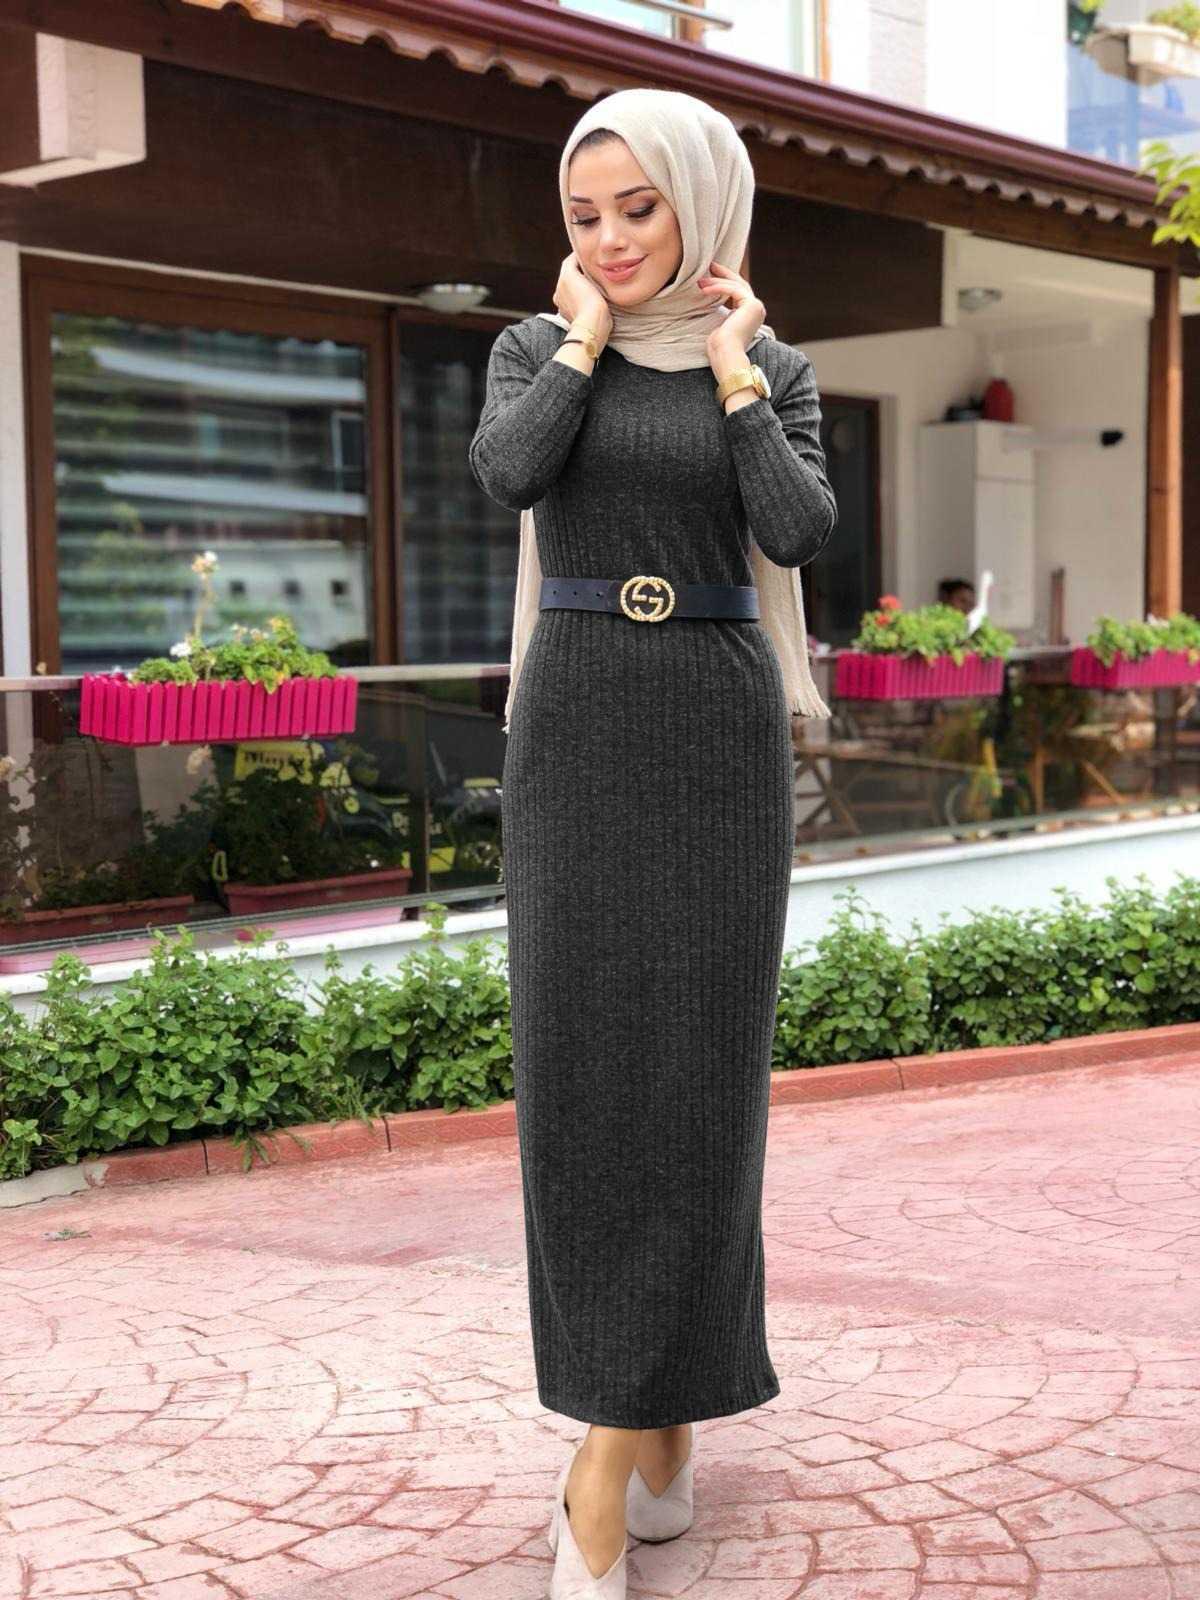 Ay Tesettür Fitilli Elbise Modelleri